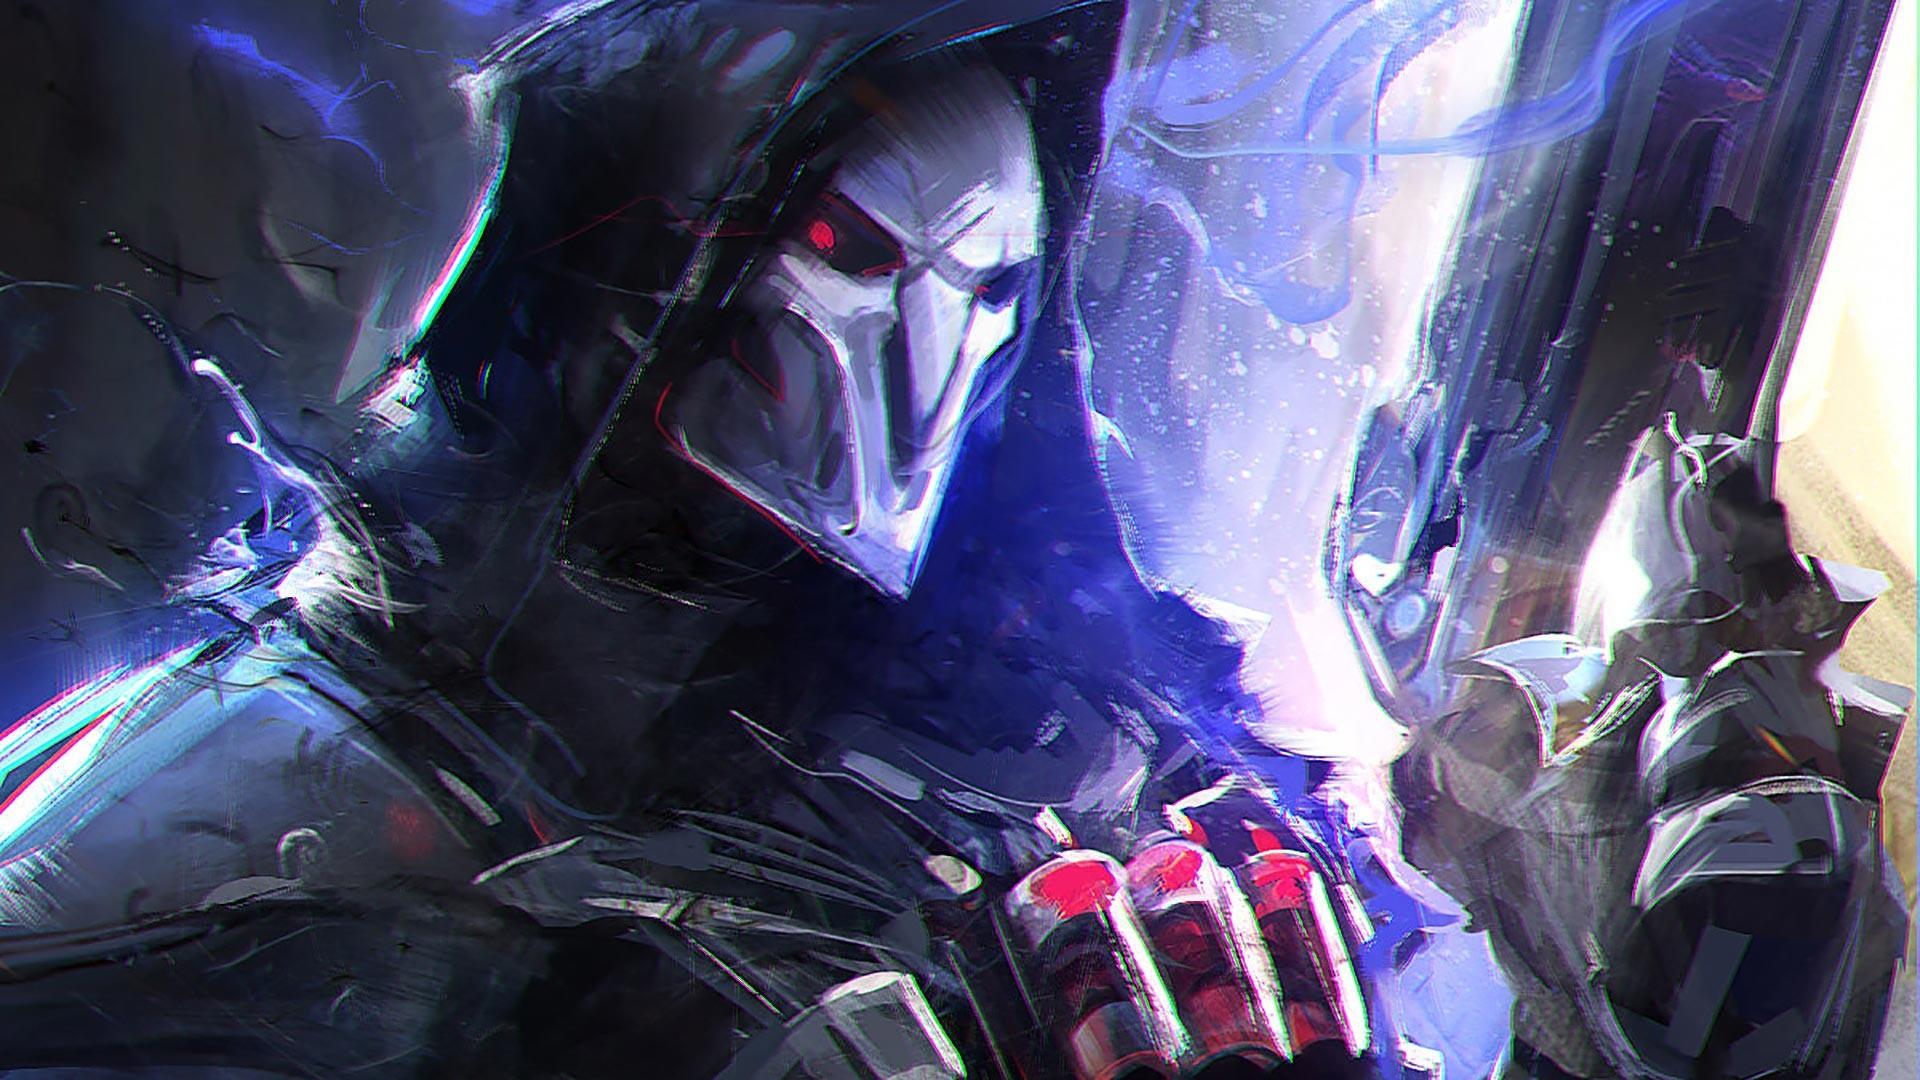 Reaper Overwatch wallpaper ·① Download free amazing full ...